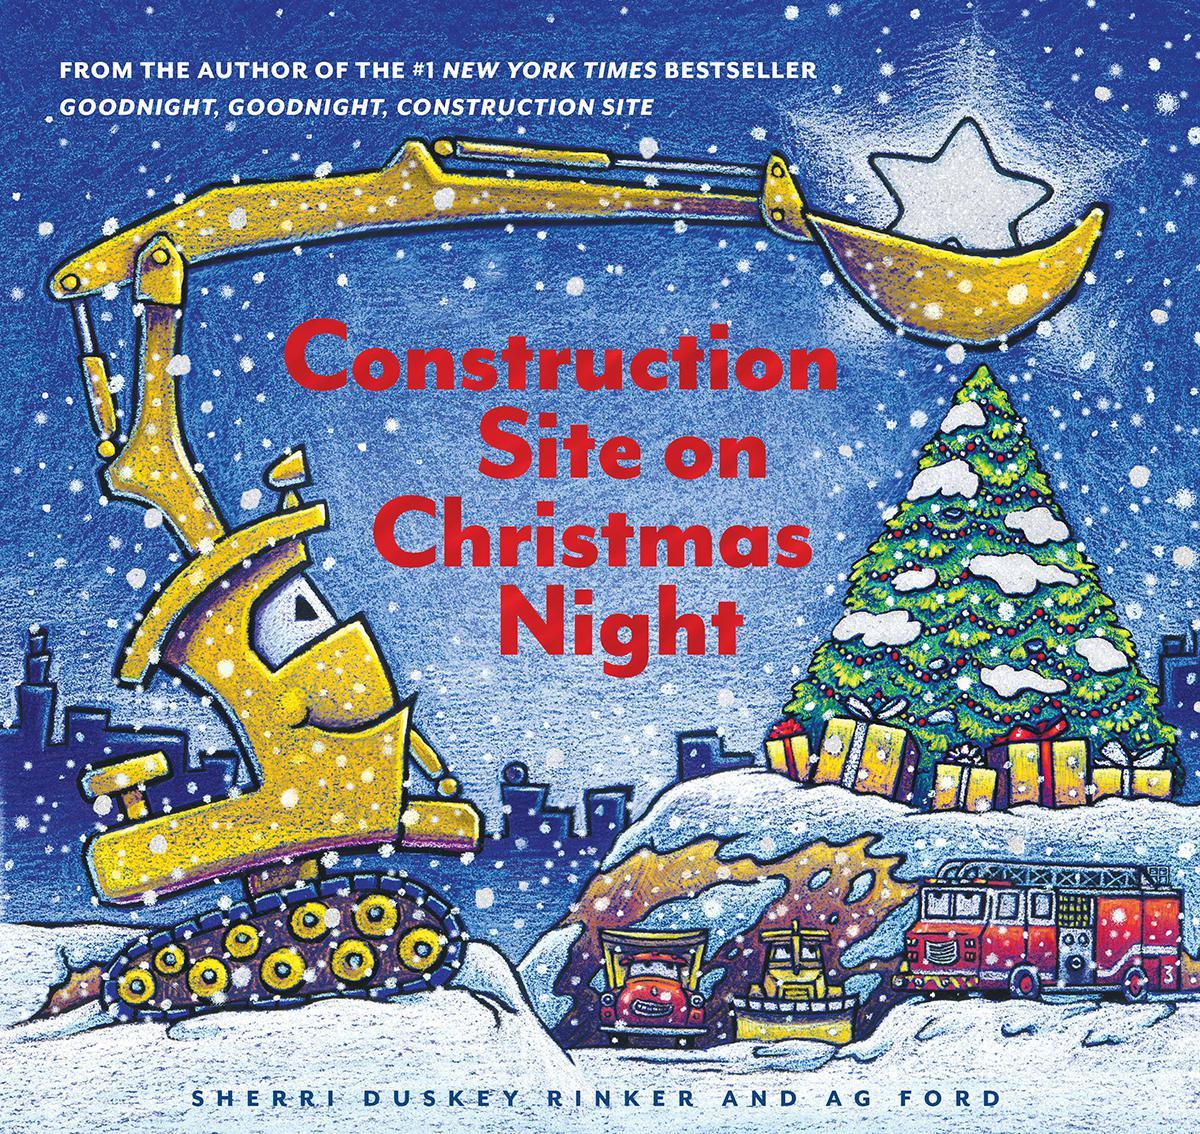 Construction Site on Christmas Night